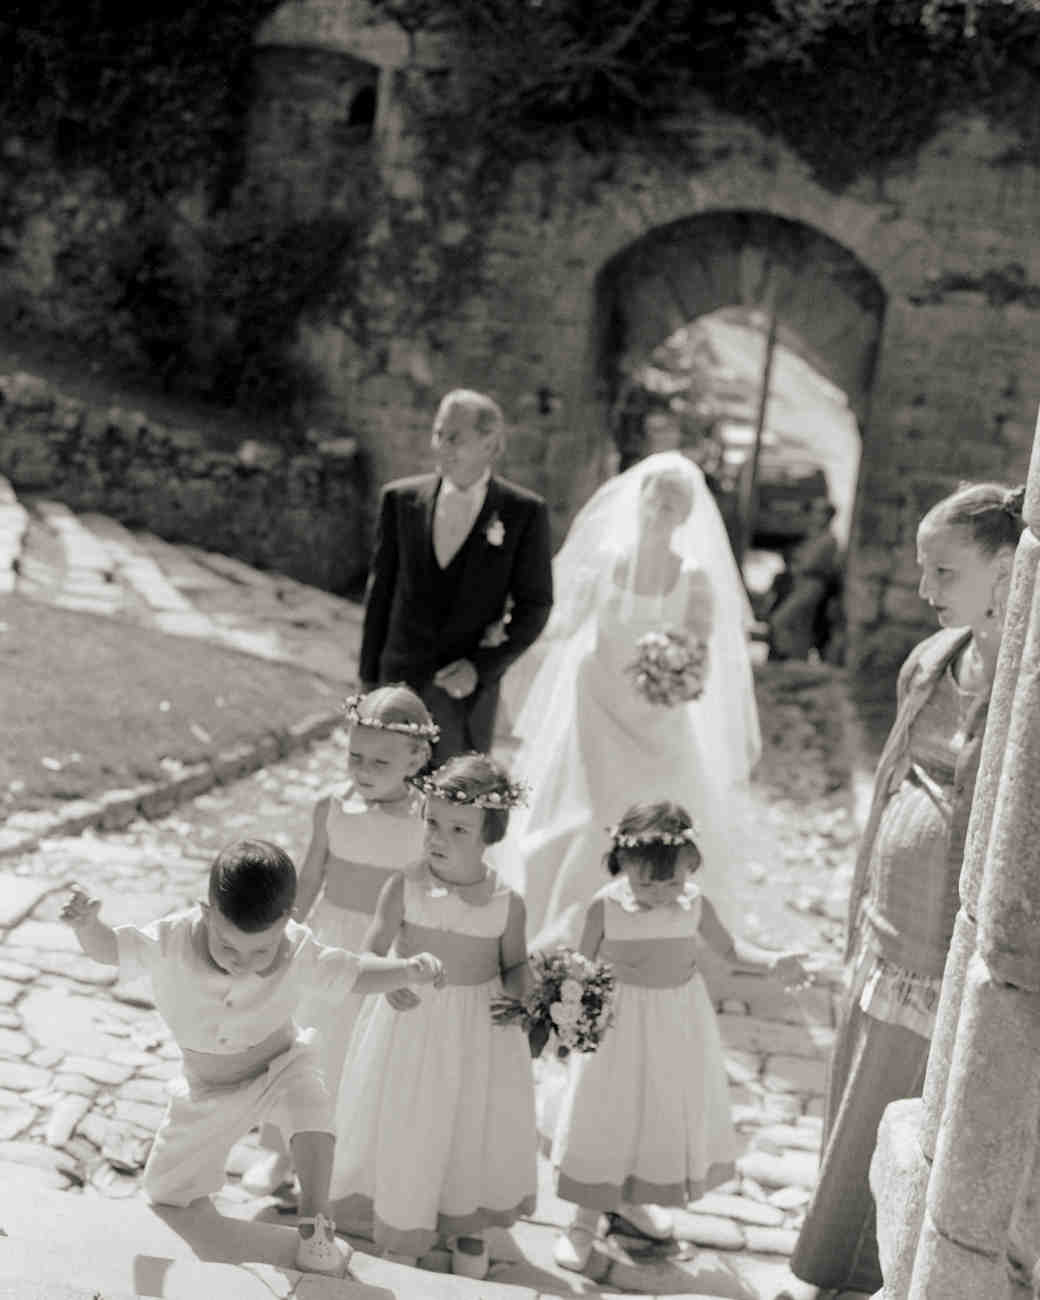 john-dolan-wedding-photographer-spring-1999-0914.jpg